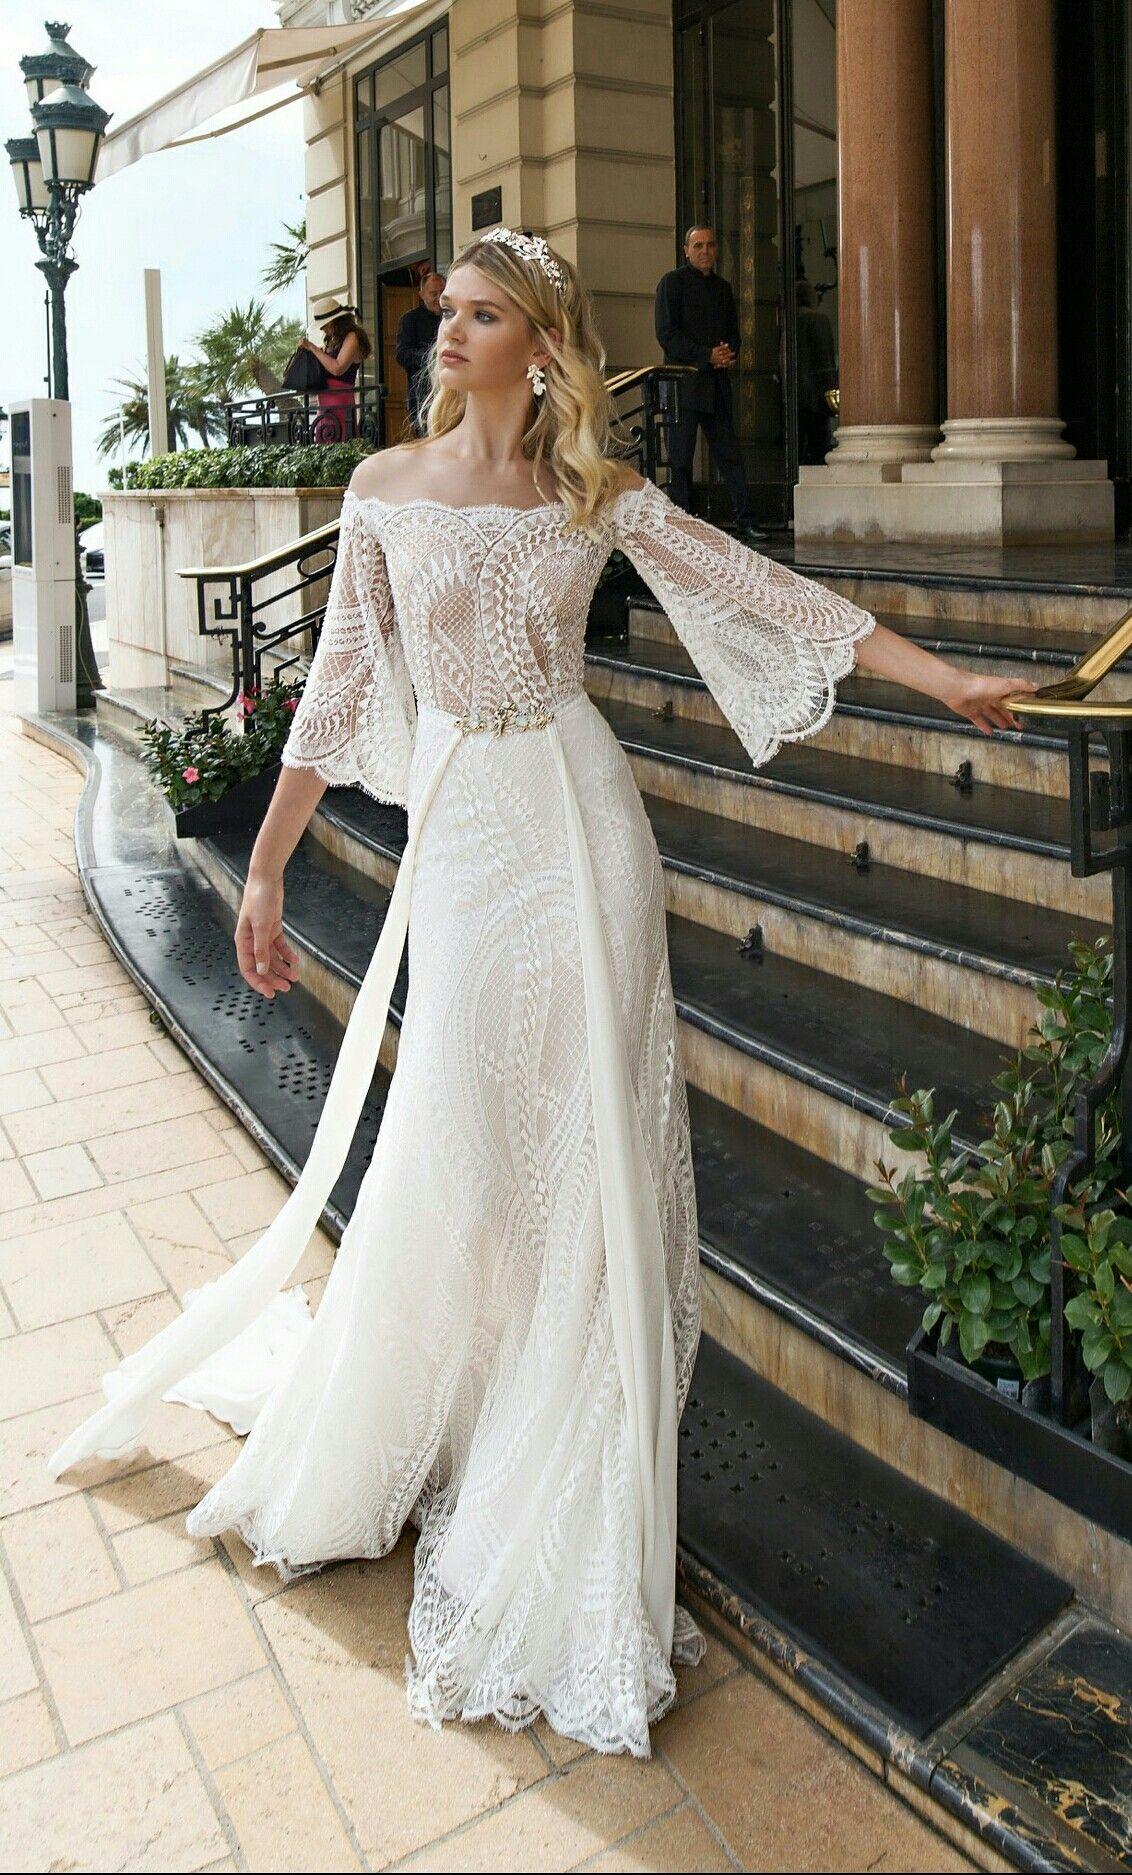 Pin by rose grangerweasley on wedding dresses pinterest weddings